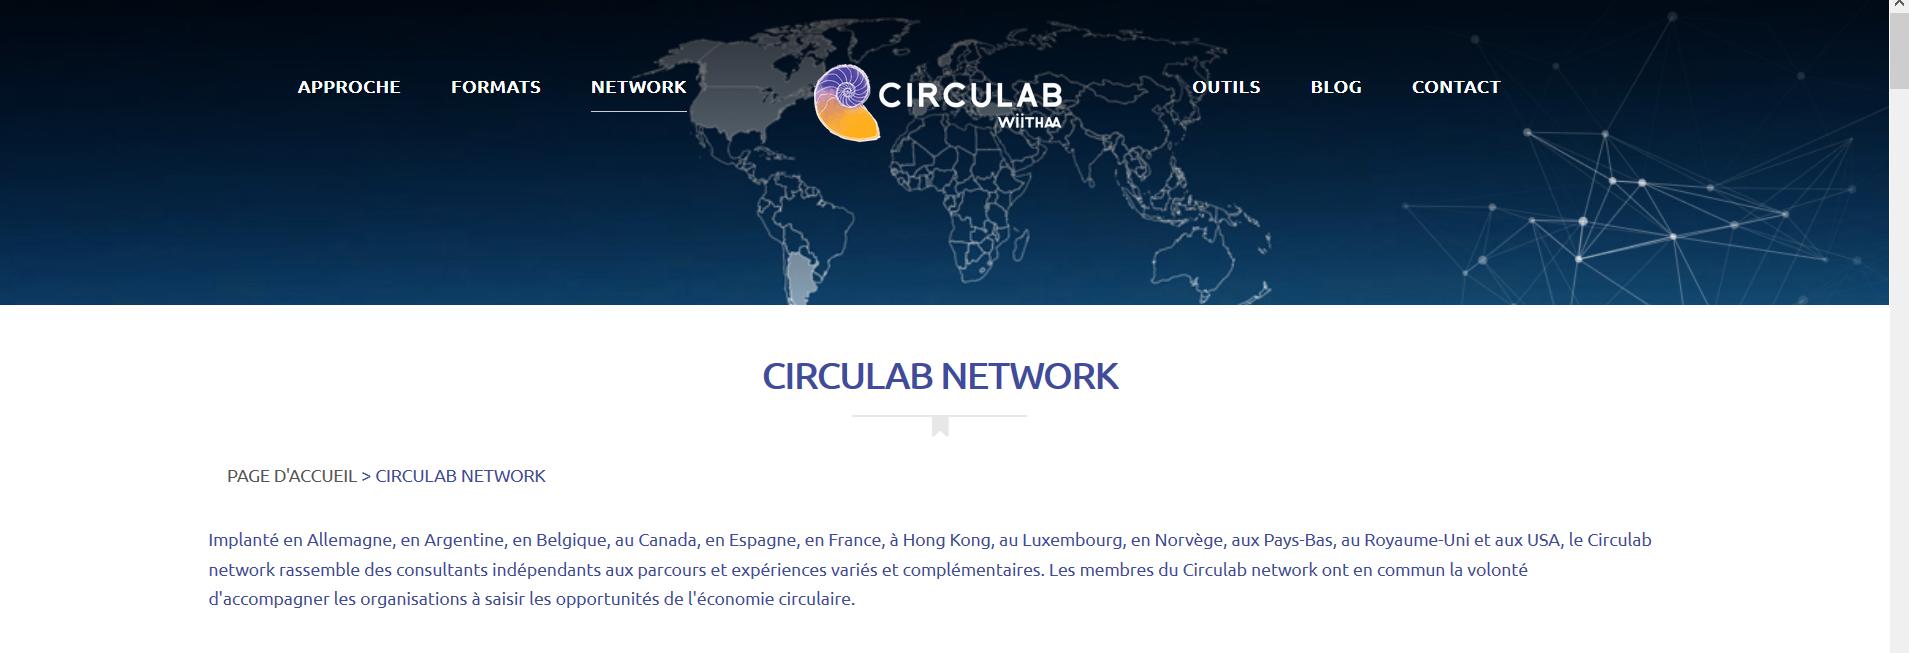 Circulab Network